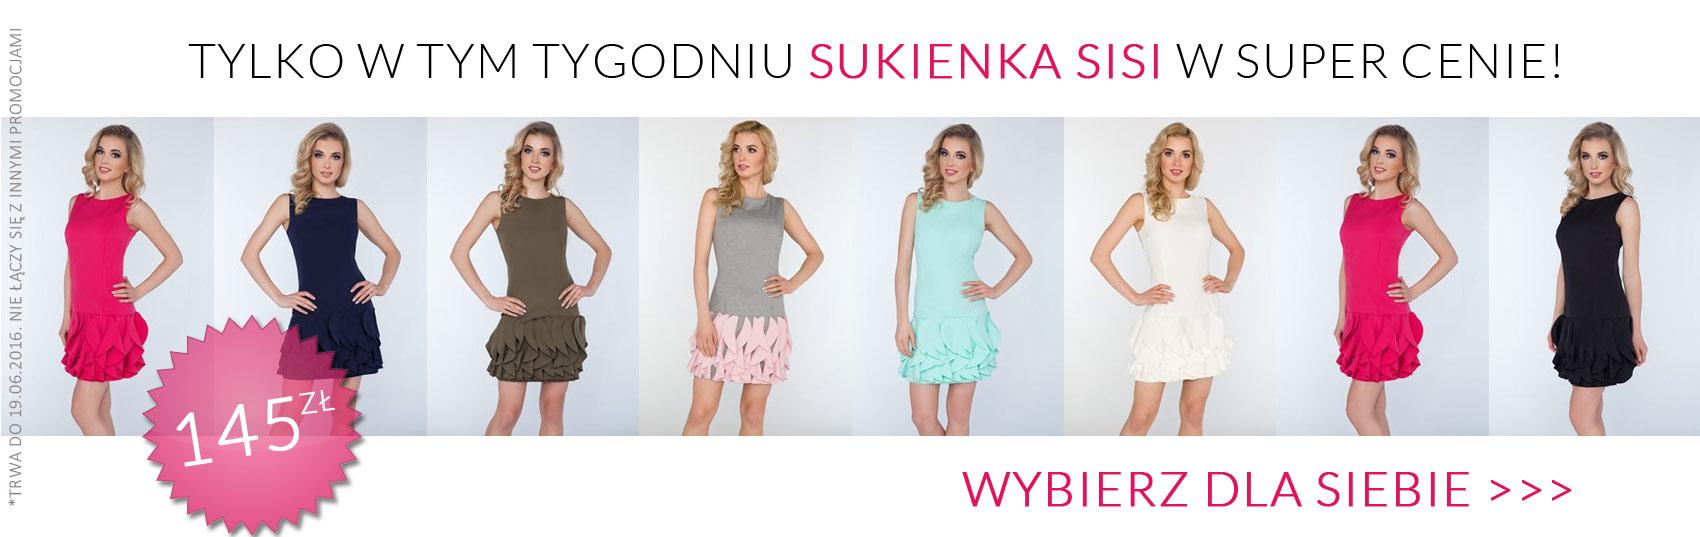 347c4a460e Limoda.pl  sukienka Sisi za 145 zł